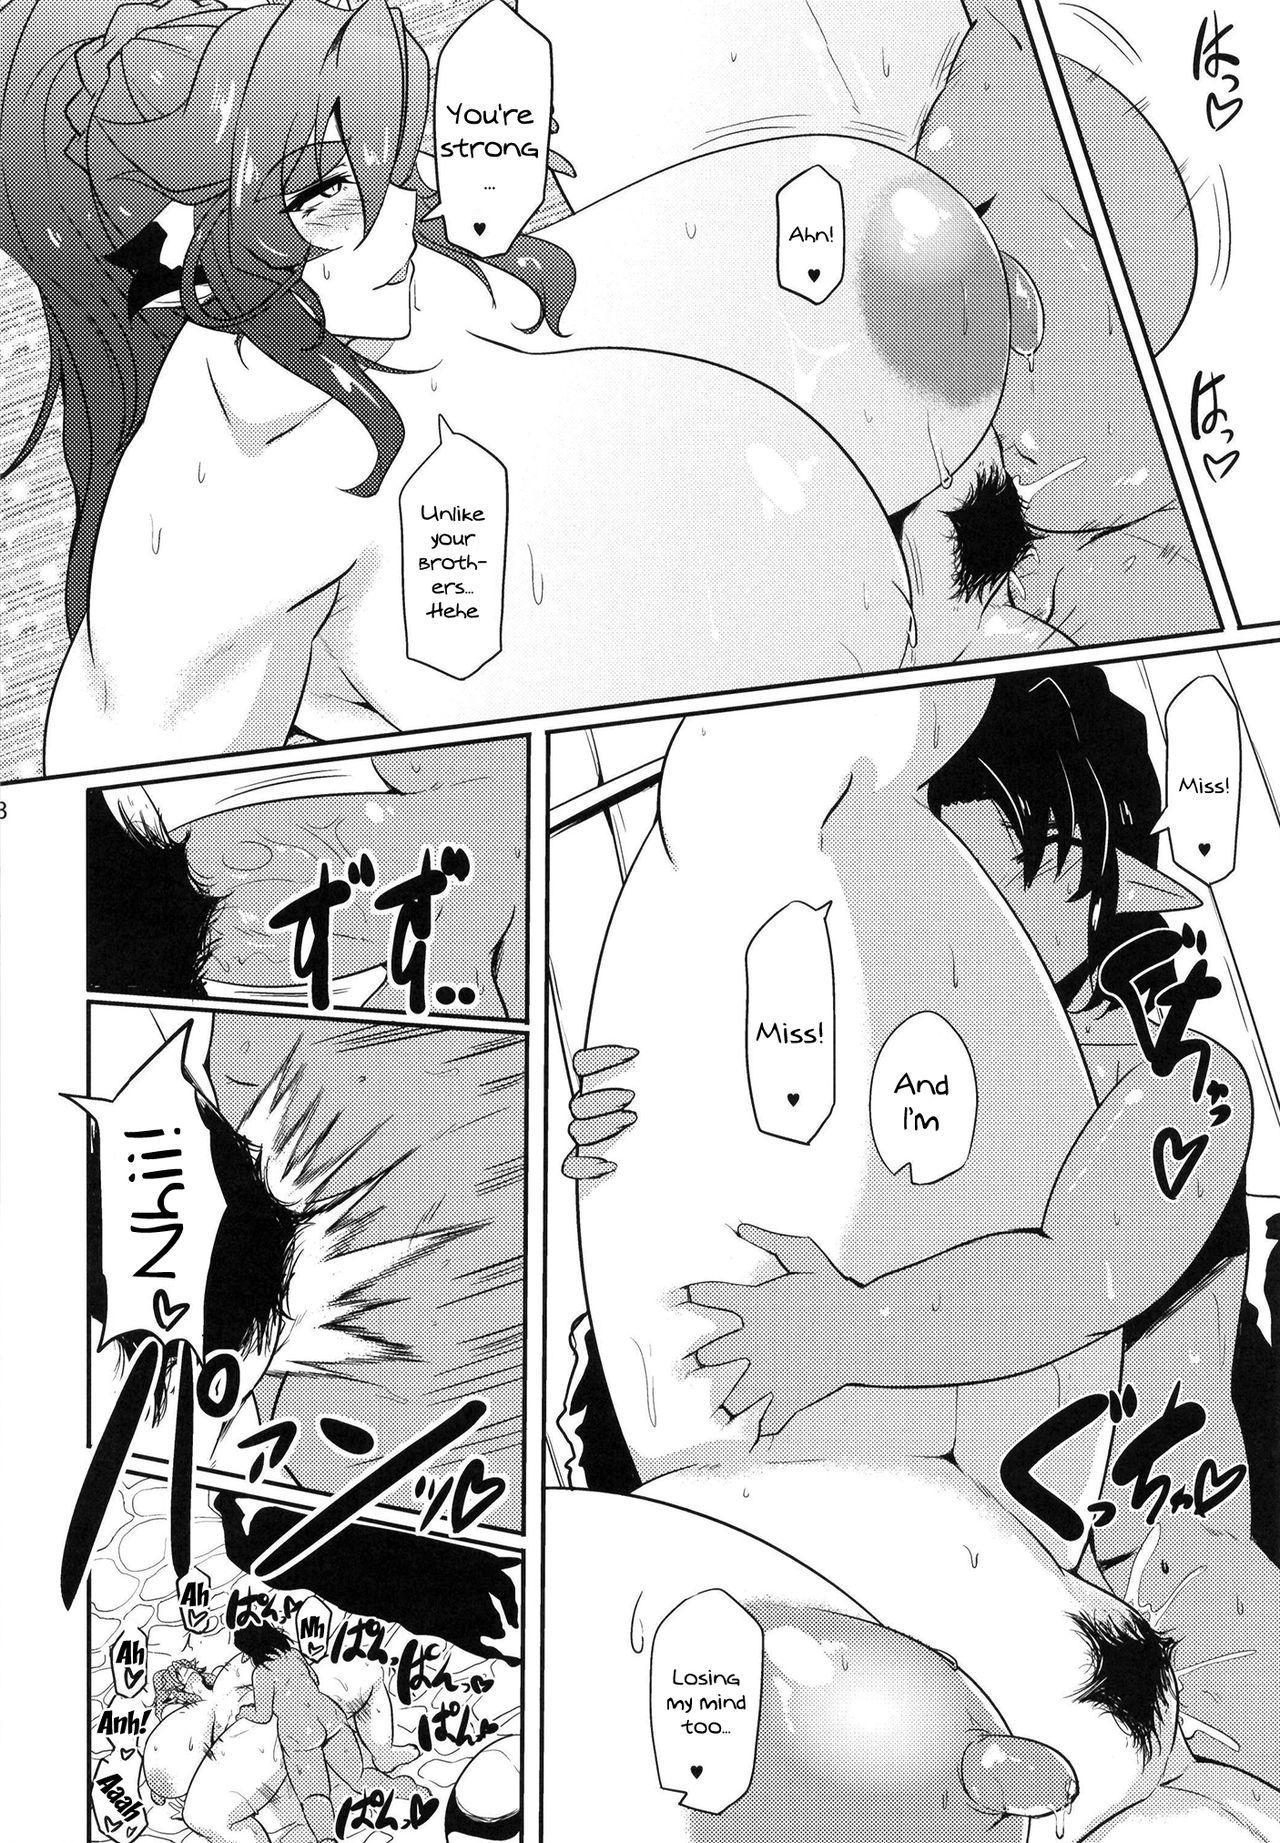 [Desk Drawer (Matsumoto Katsuya)] GYU-DON!! 2 -Chaotic Flowerfall [English] {Doujins.com} [Digital] 17